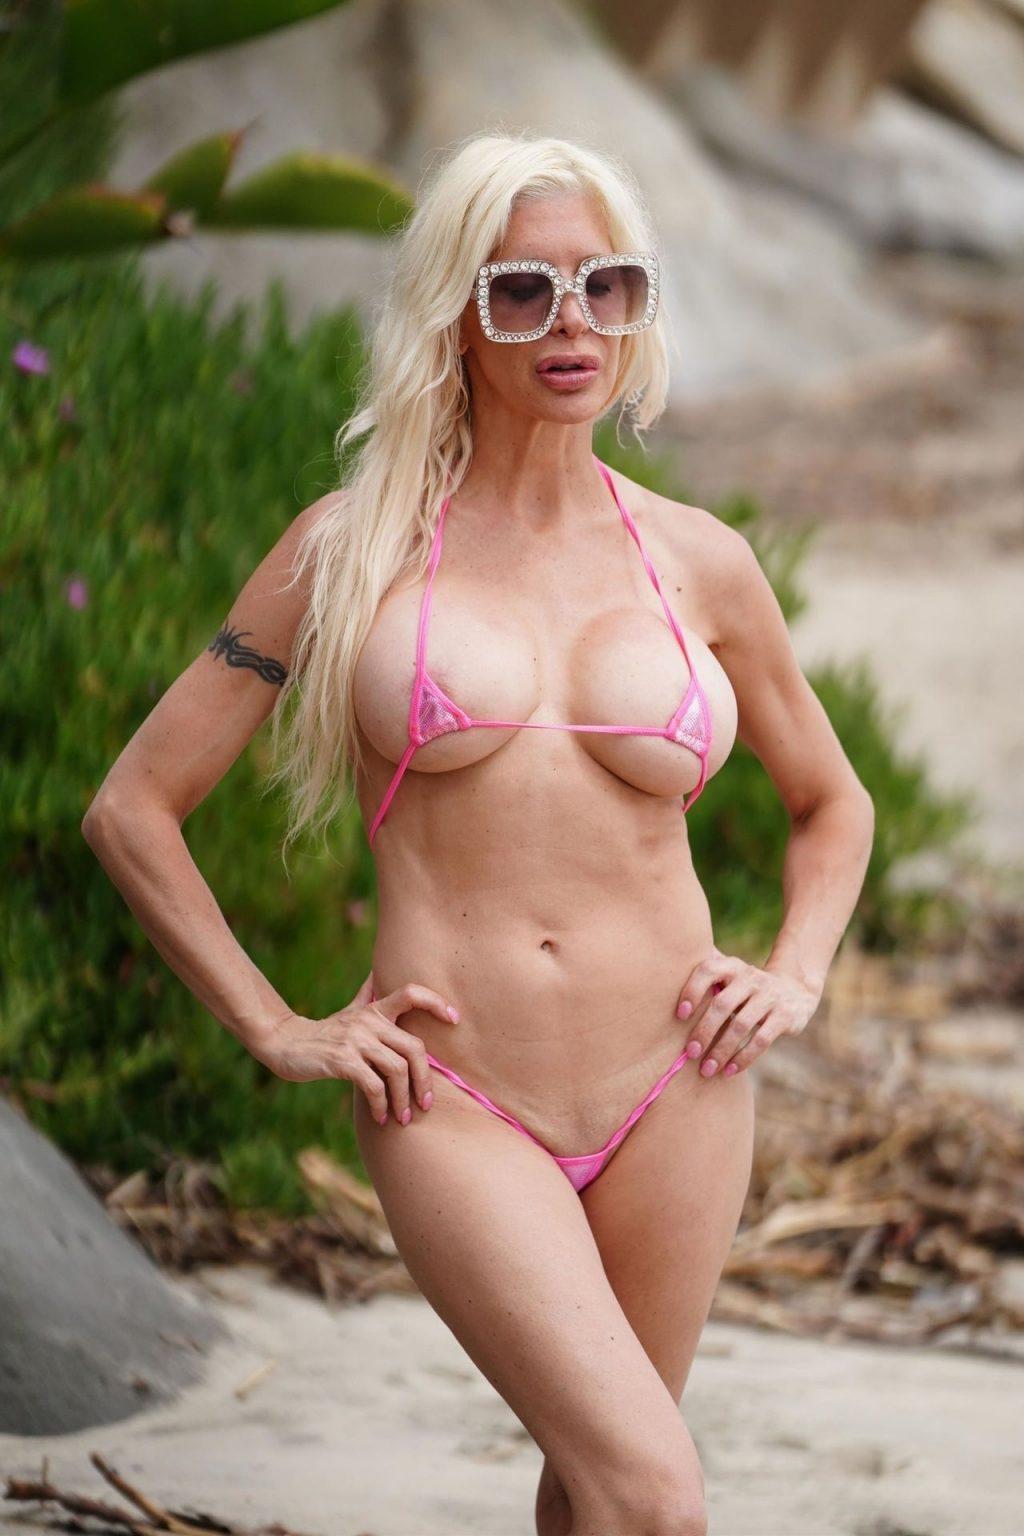 Frenchy Morgan Wears a Barely There Bikini in Malibu (21 Photos)